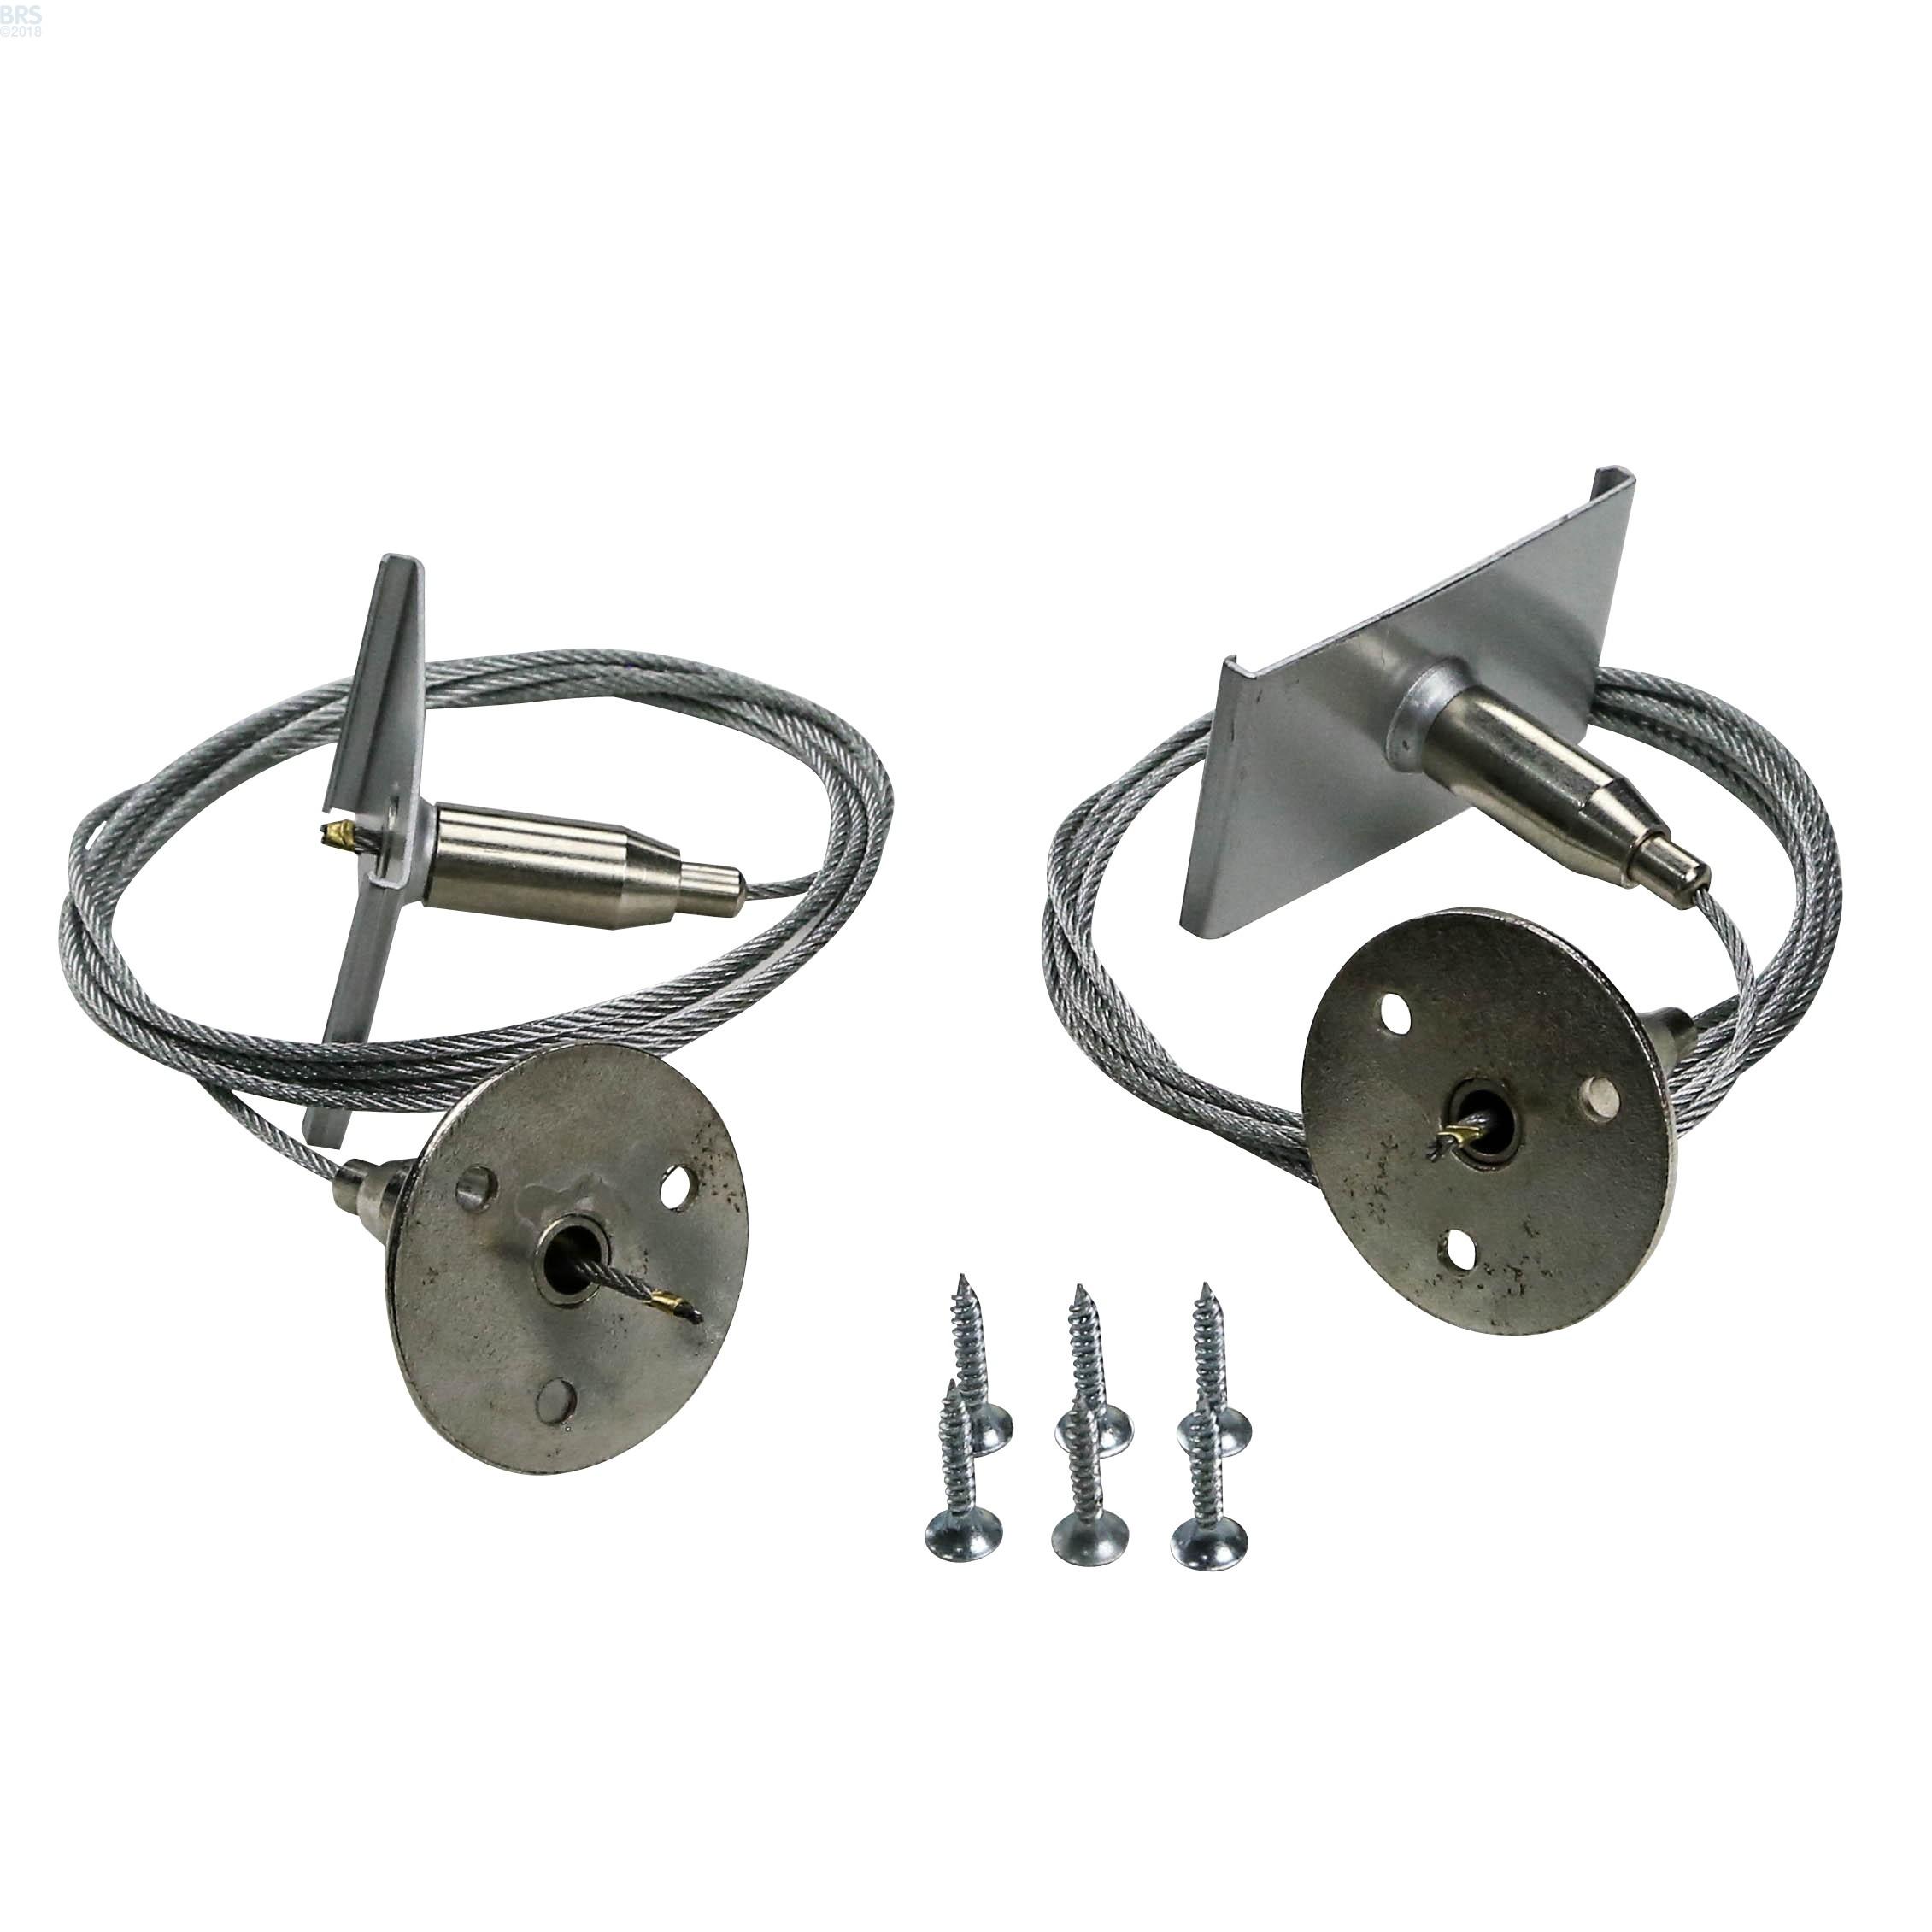 Hamilton Technology Bimini Sun 250w Metal Halide System: Bimini Sun Hanging Kit